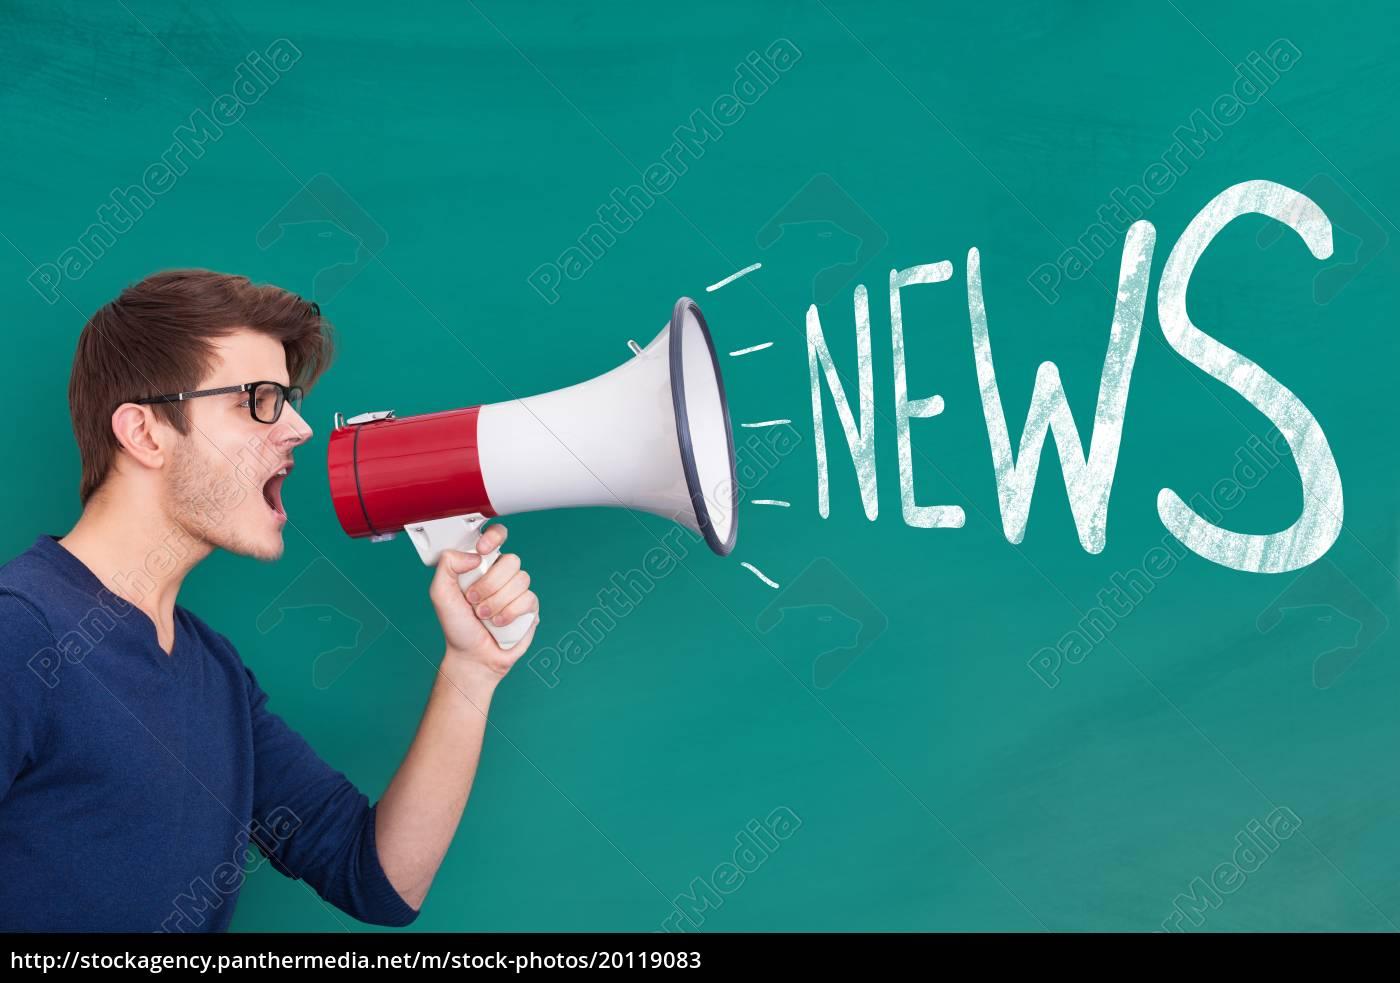 young, man, shouting, in, megaphone - 20119083